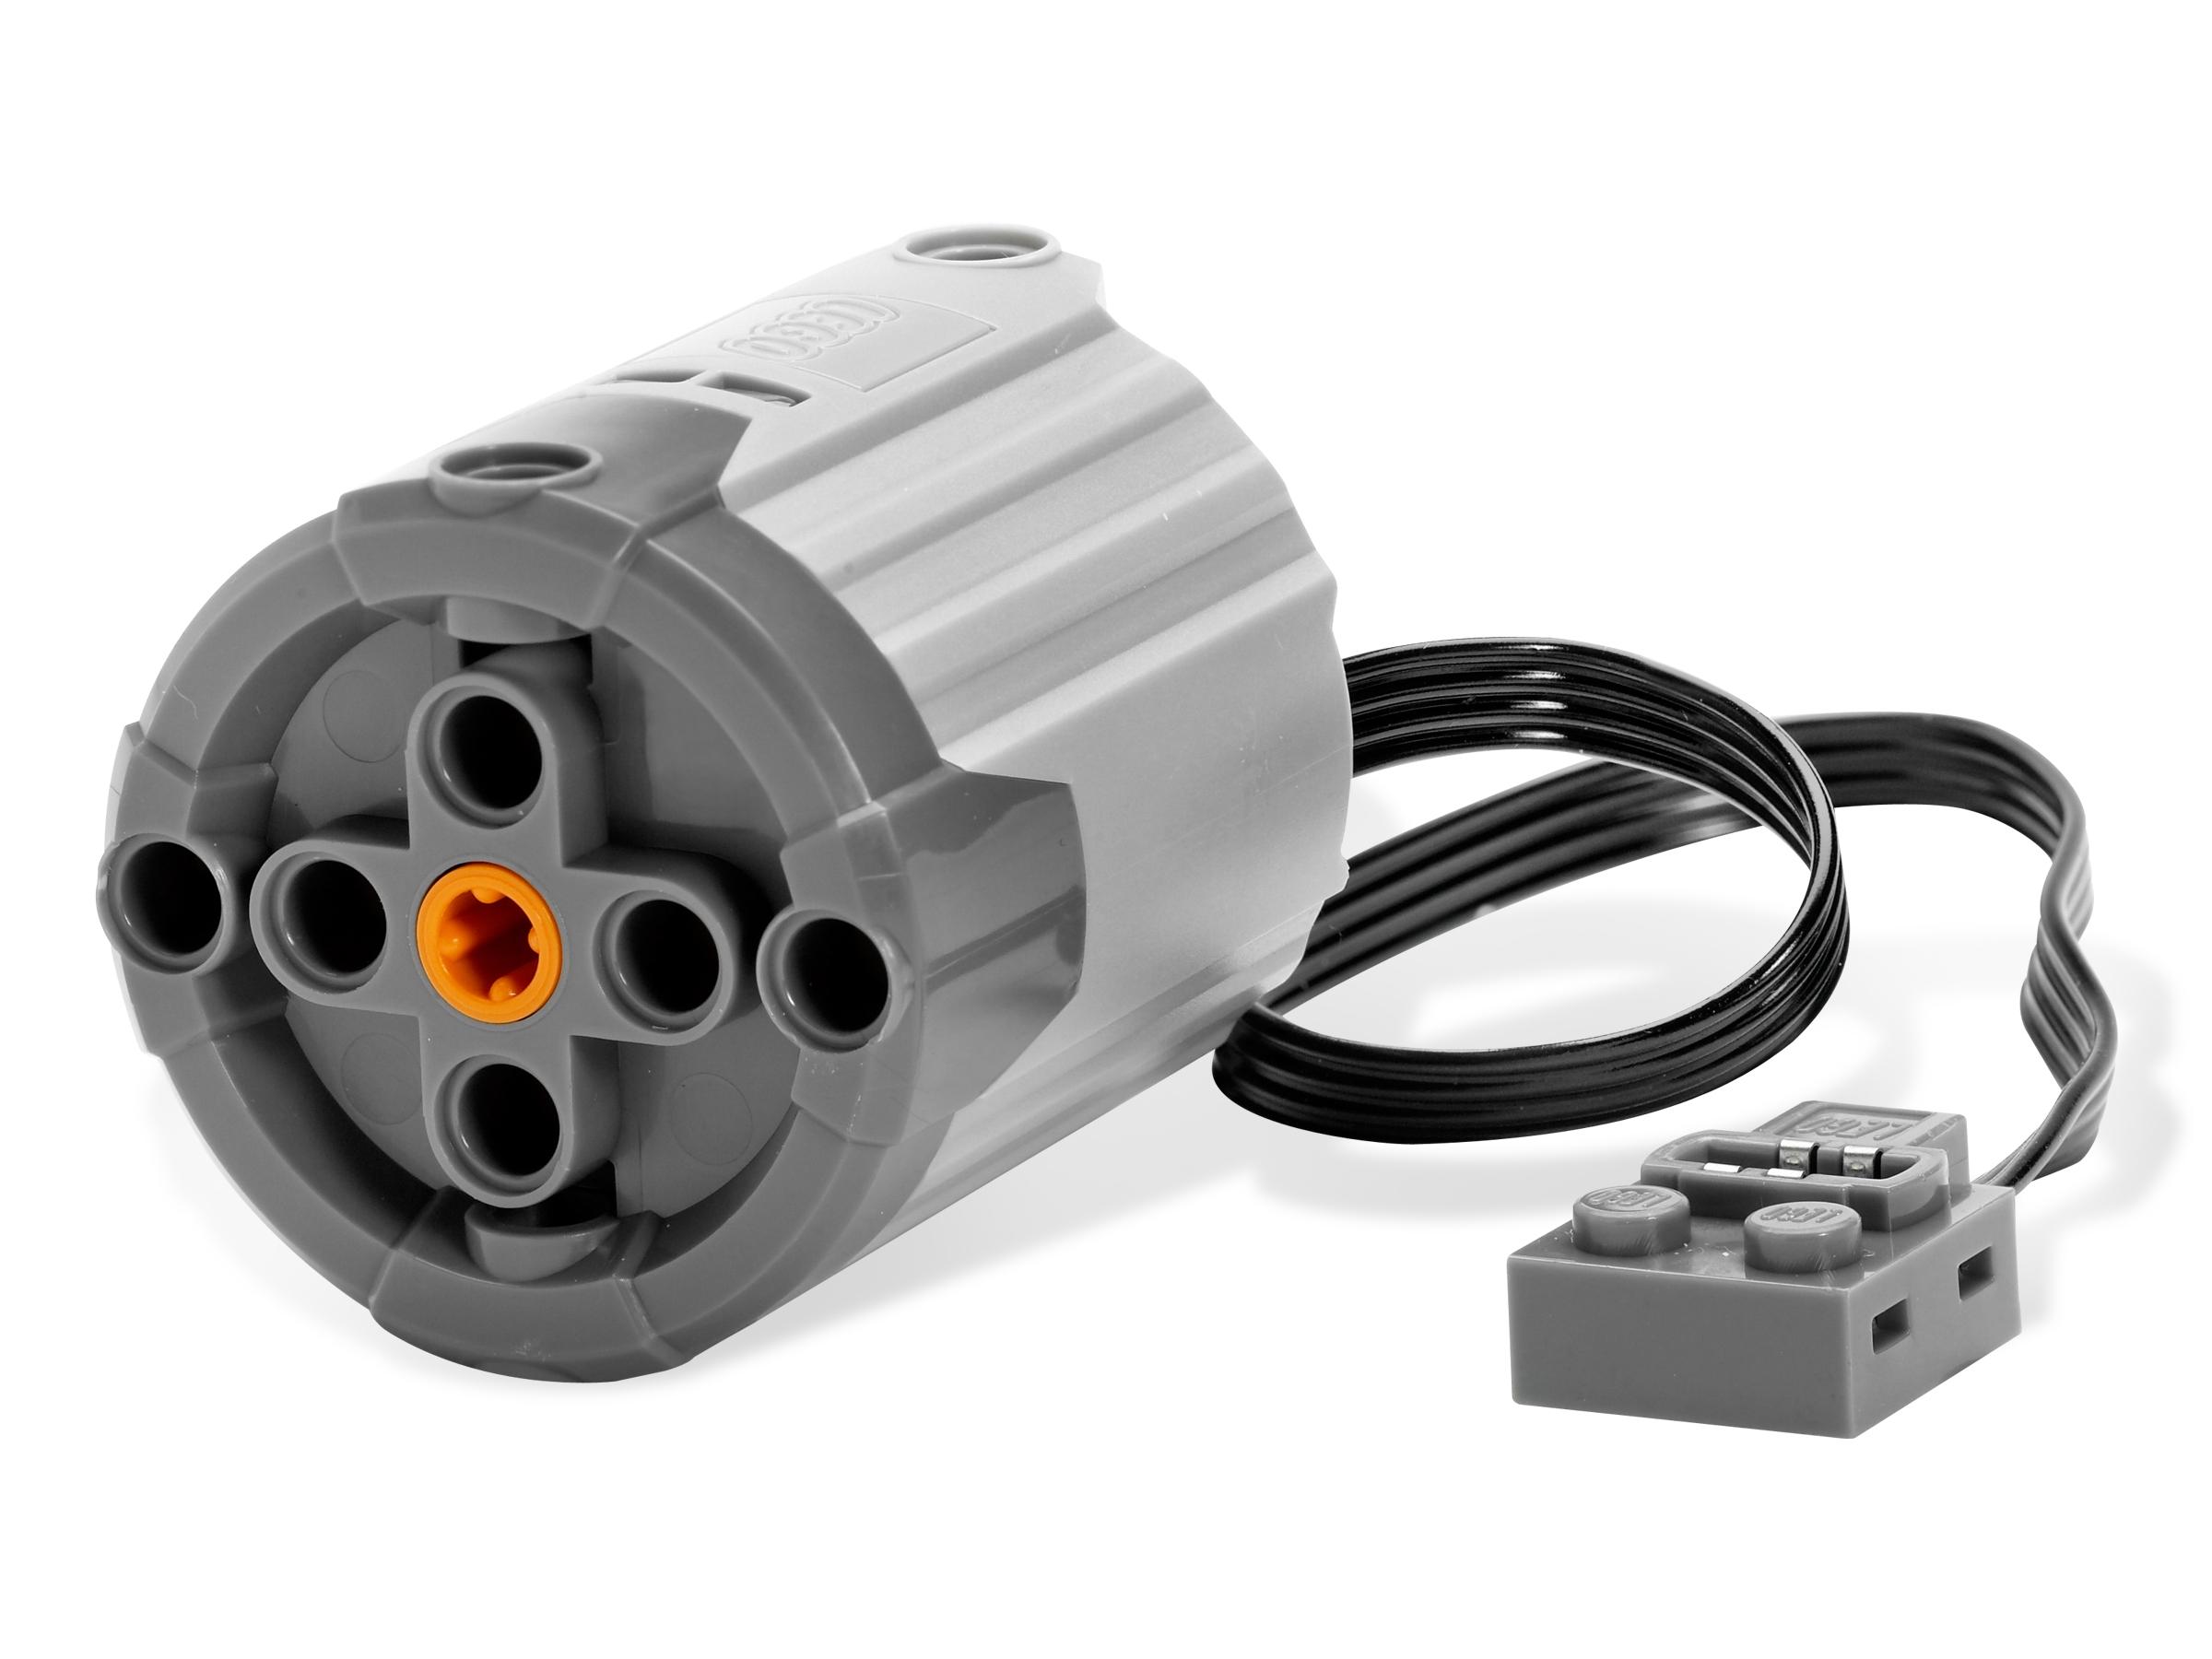 lego 8882 power functions xl moottori